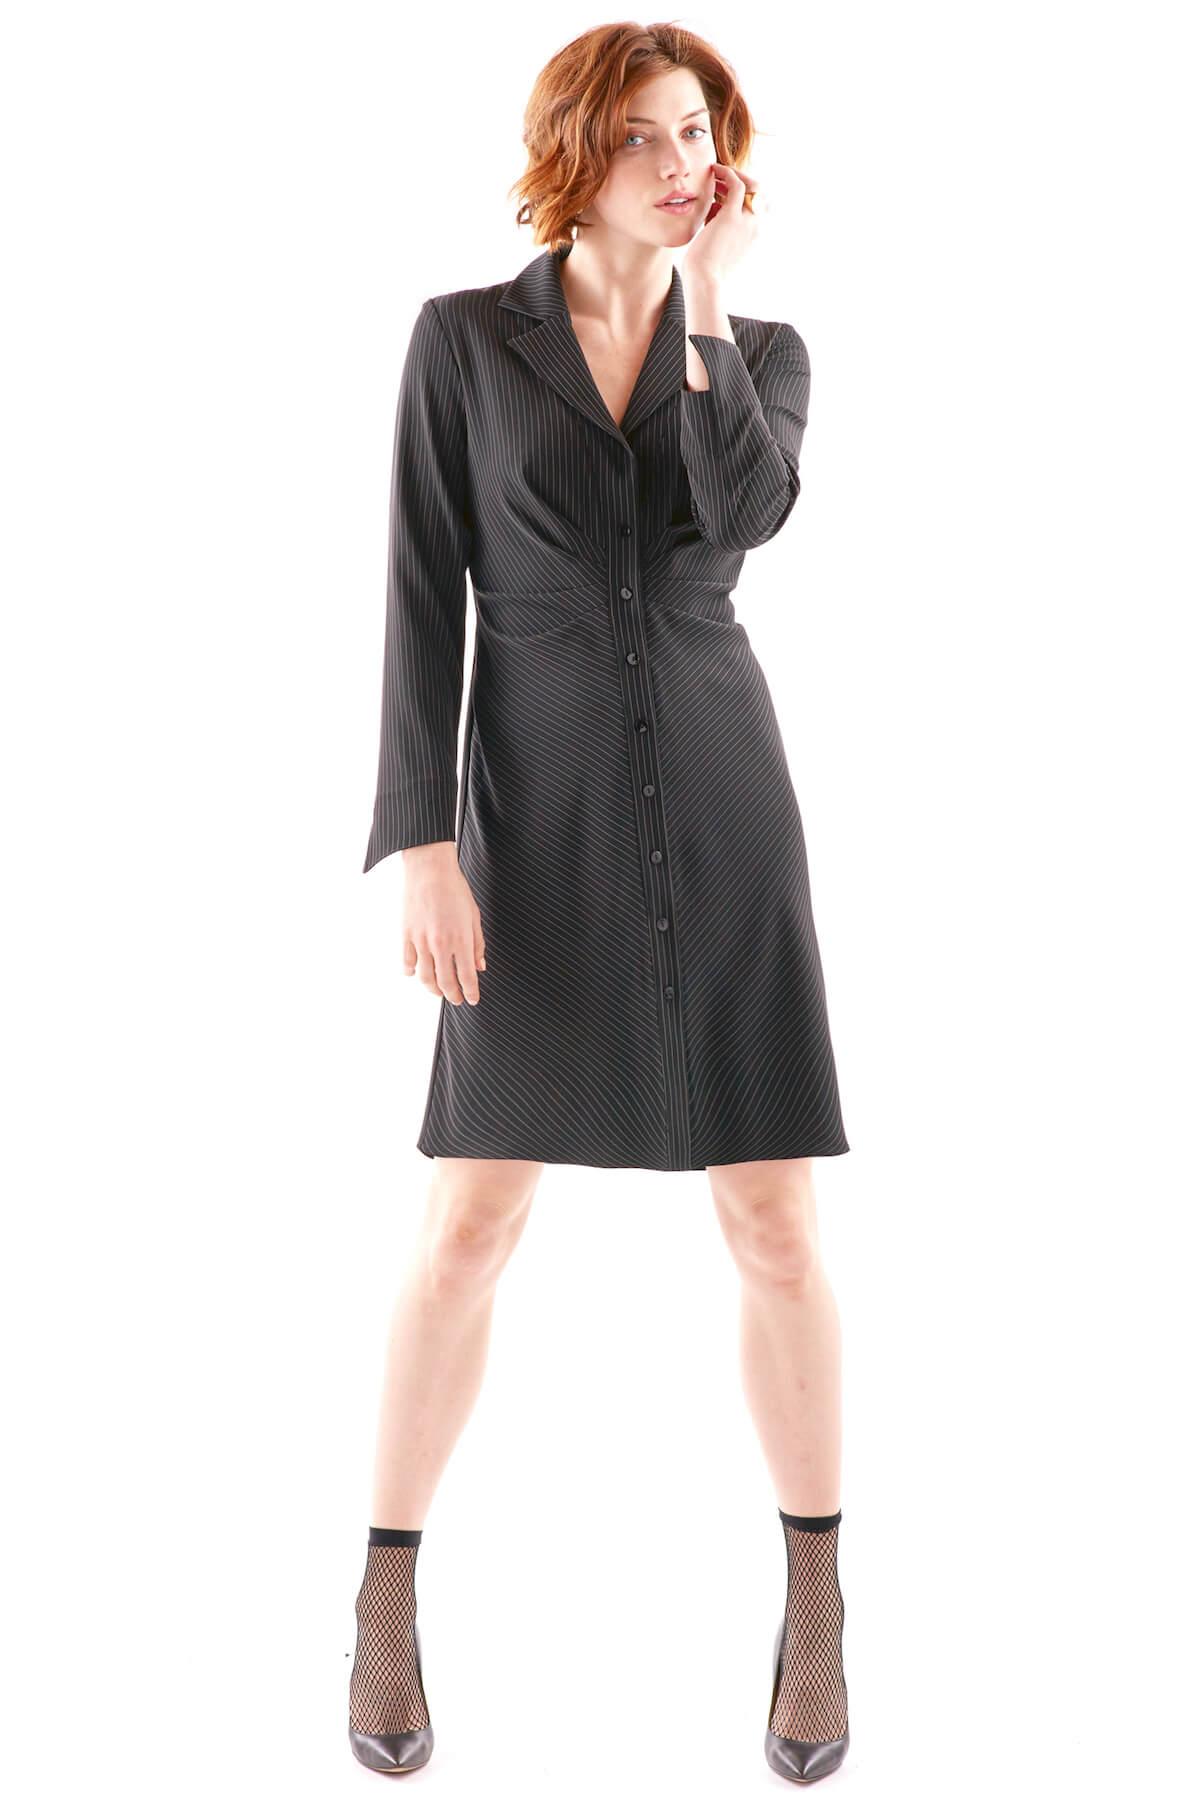 Finley_Shirts_Cleo_Dress